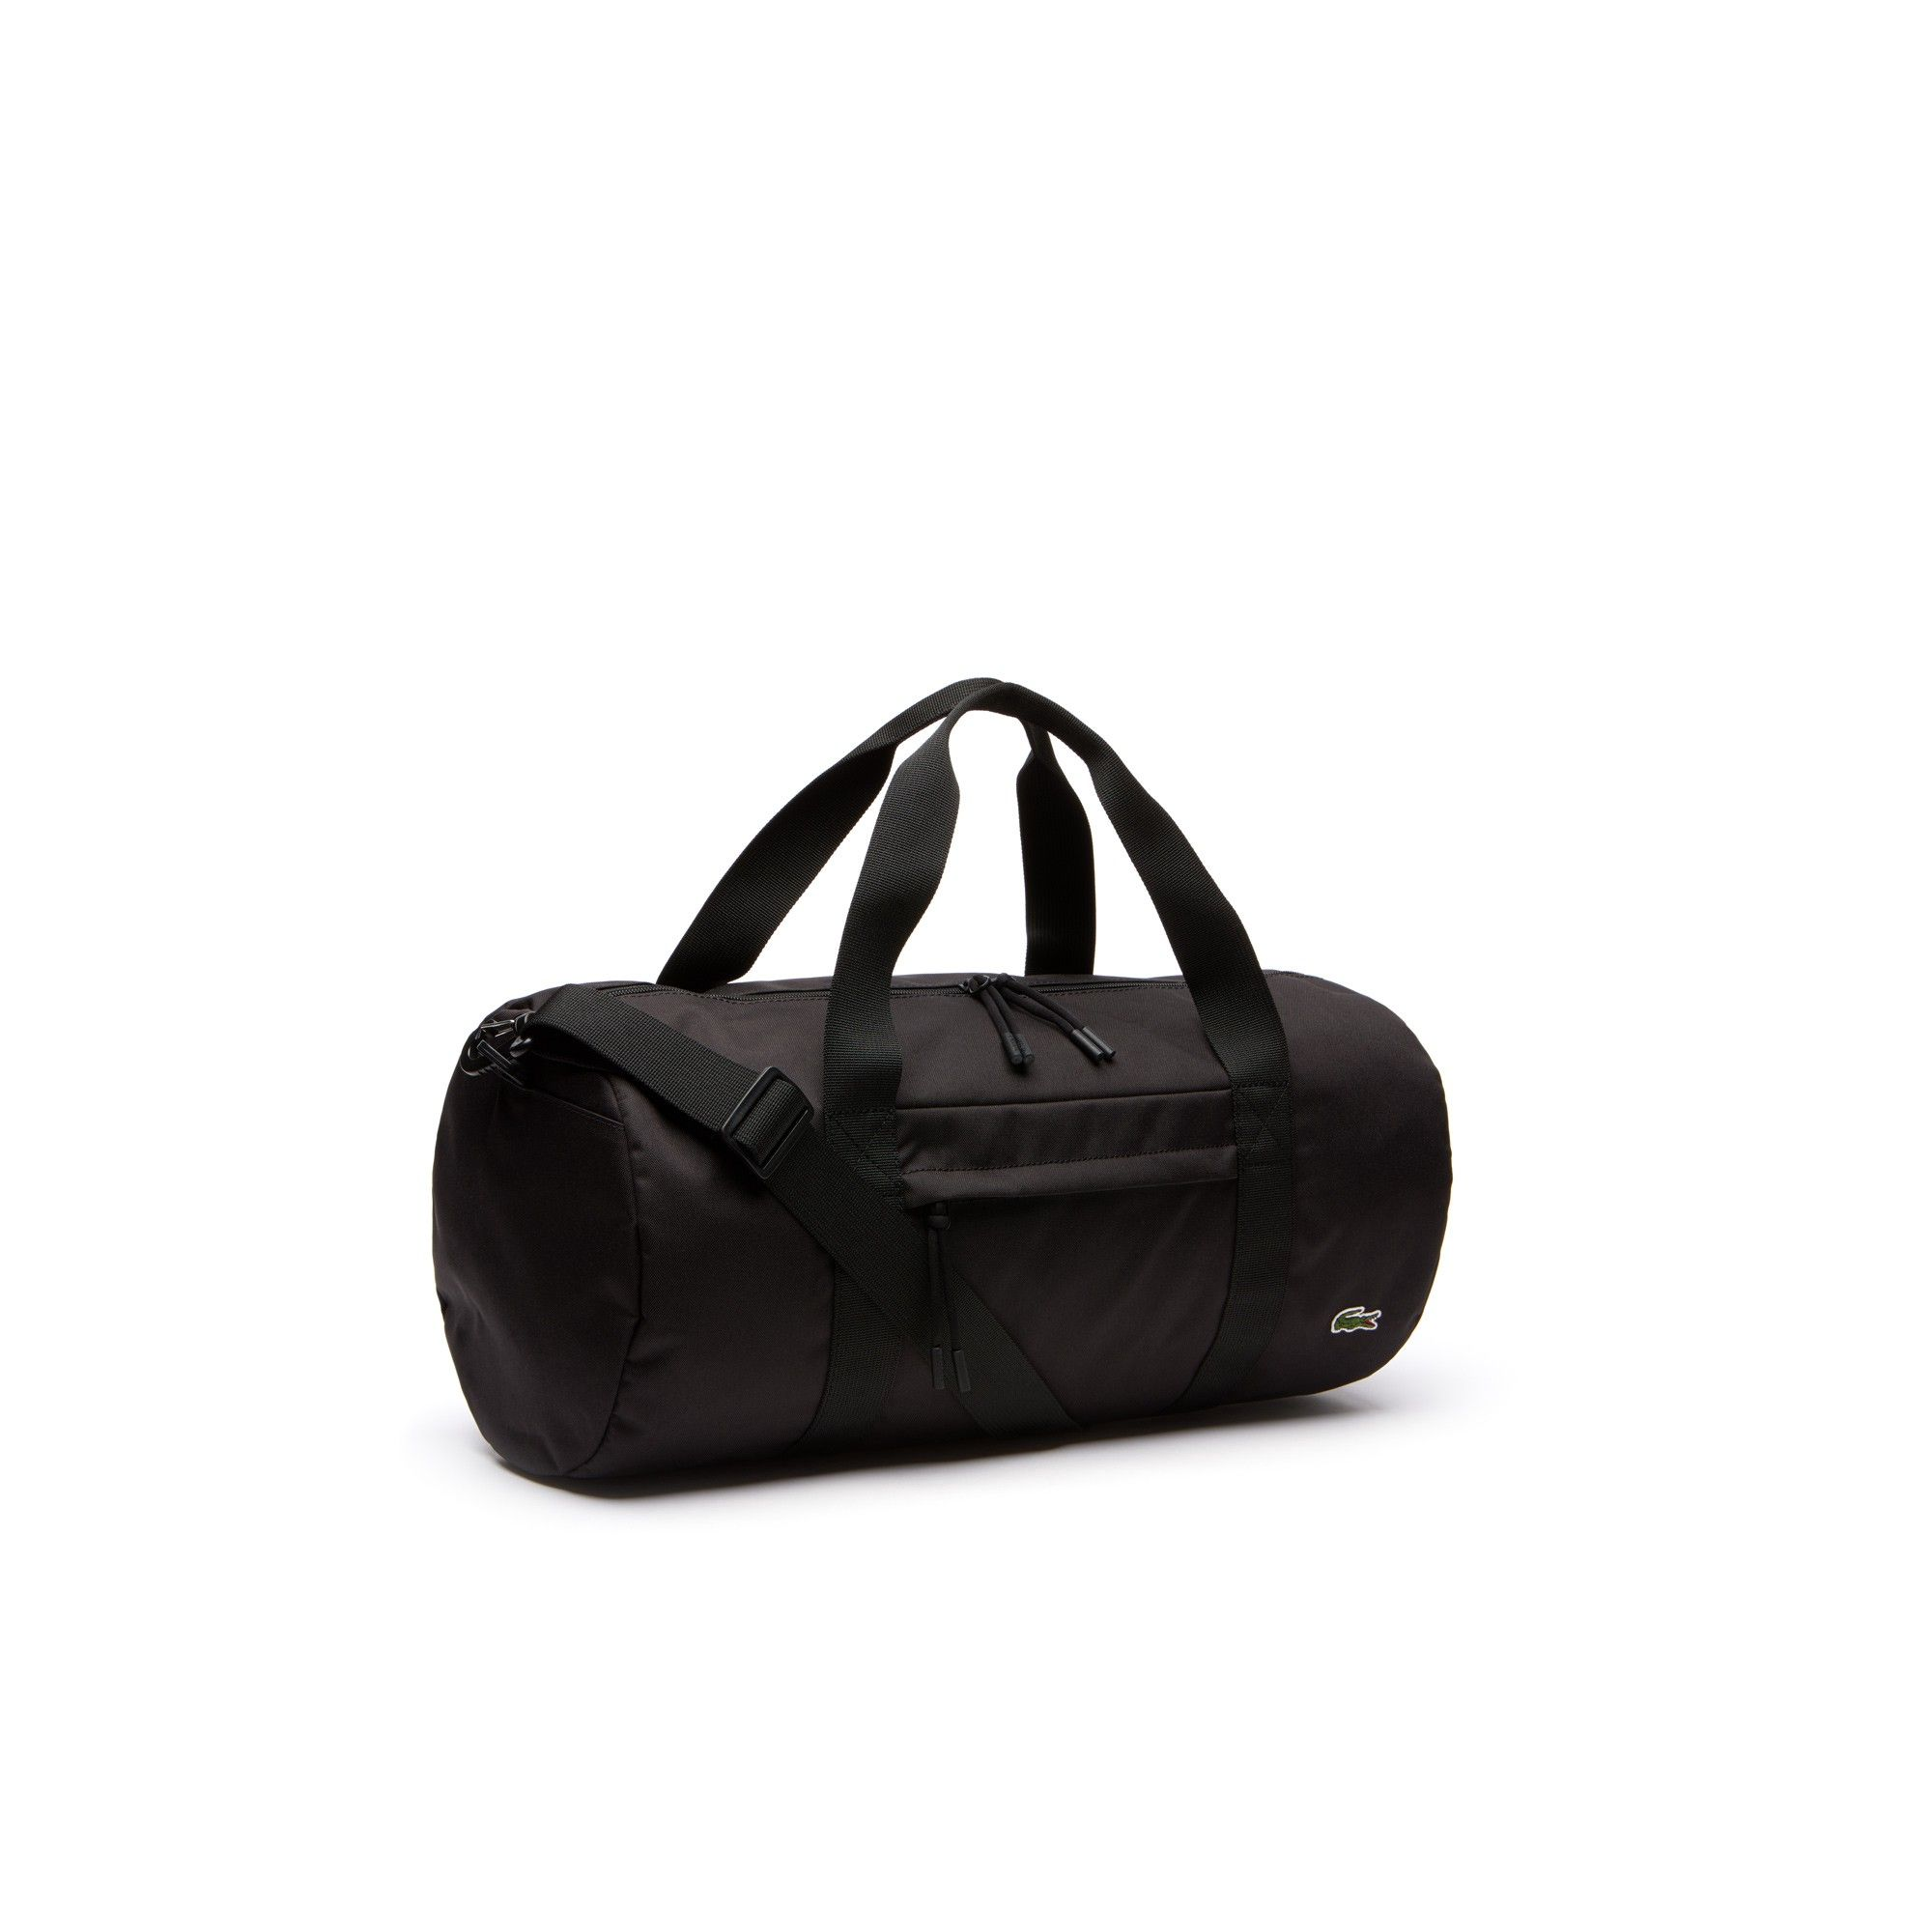 16dc464d9da Lacoste sport fashion messenger bag | Shipped Free at Zappos